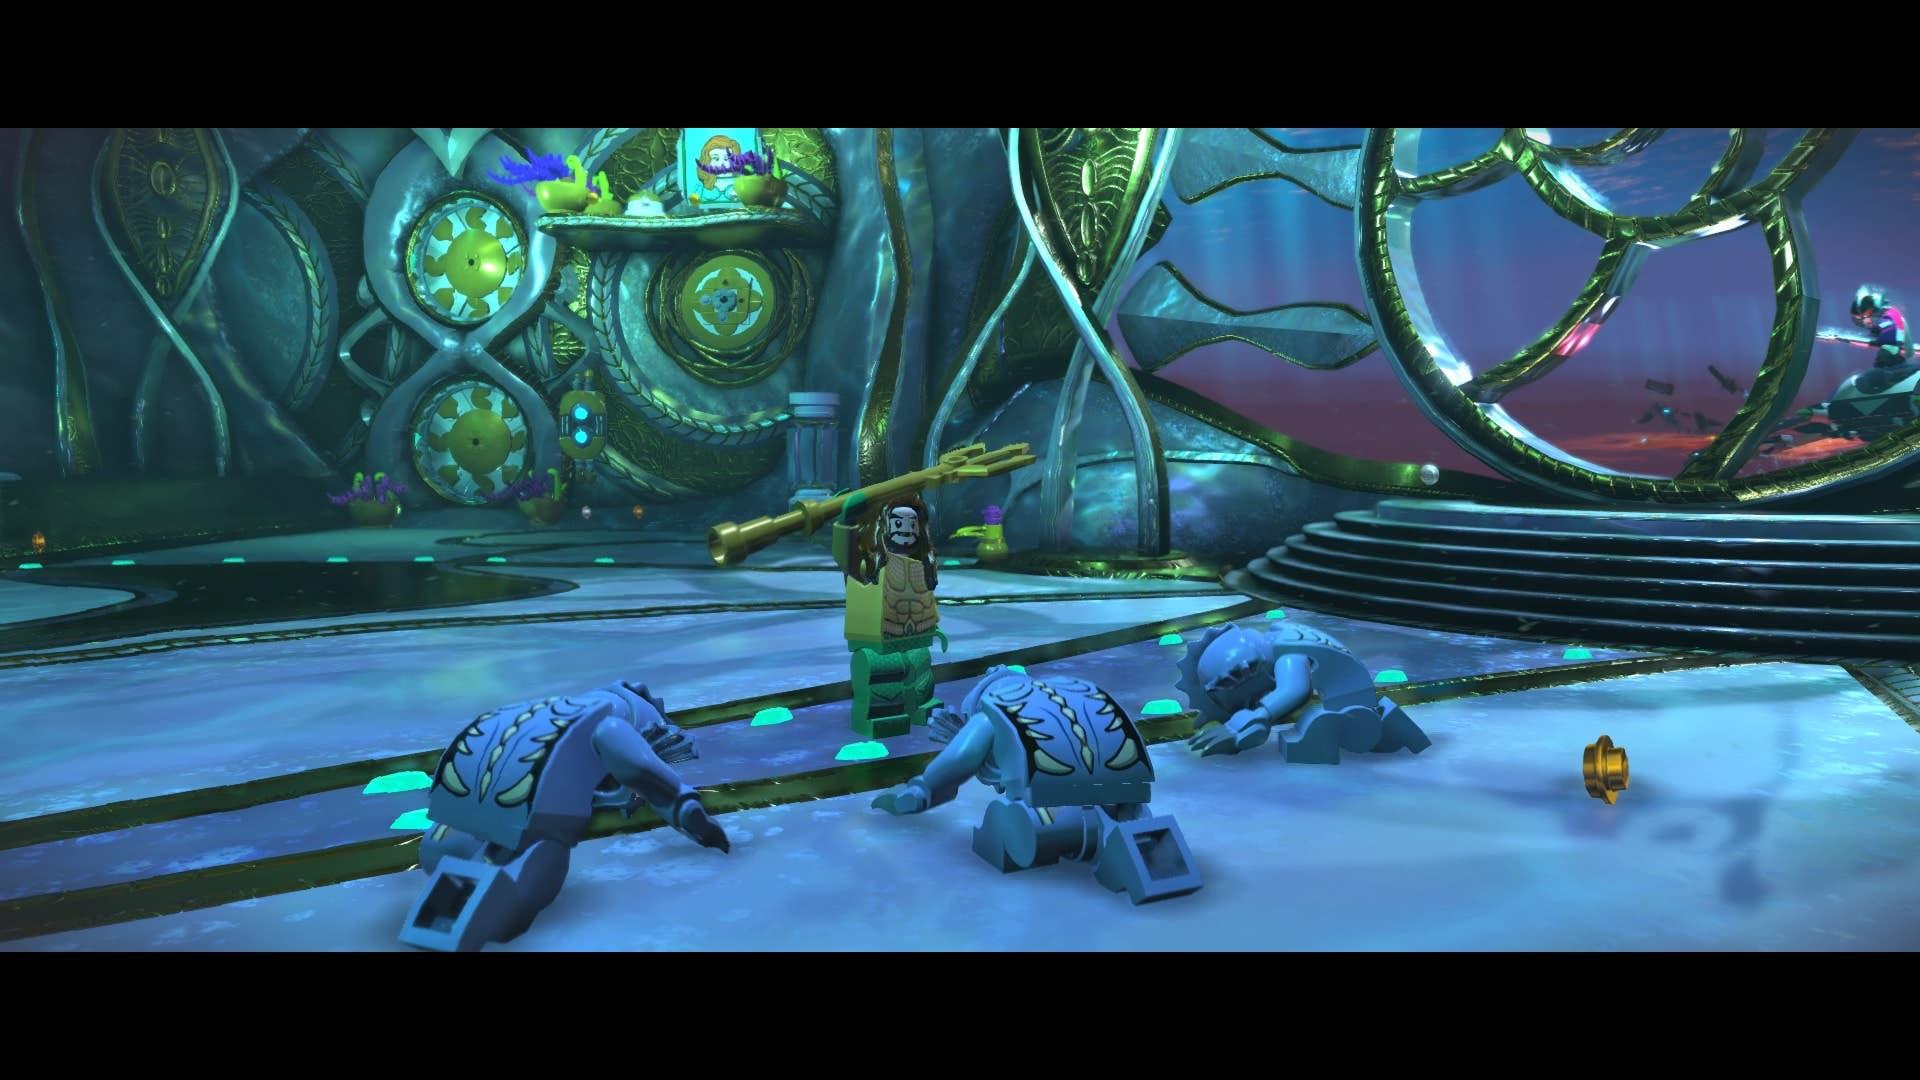 LEGO DC Super Villains Screenshot3 1546901529